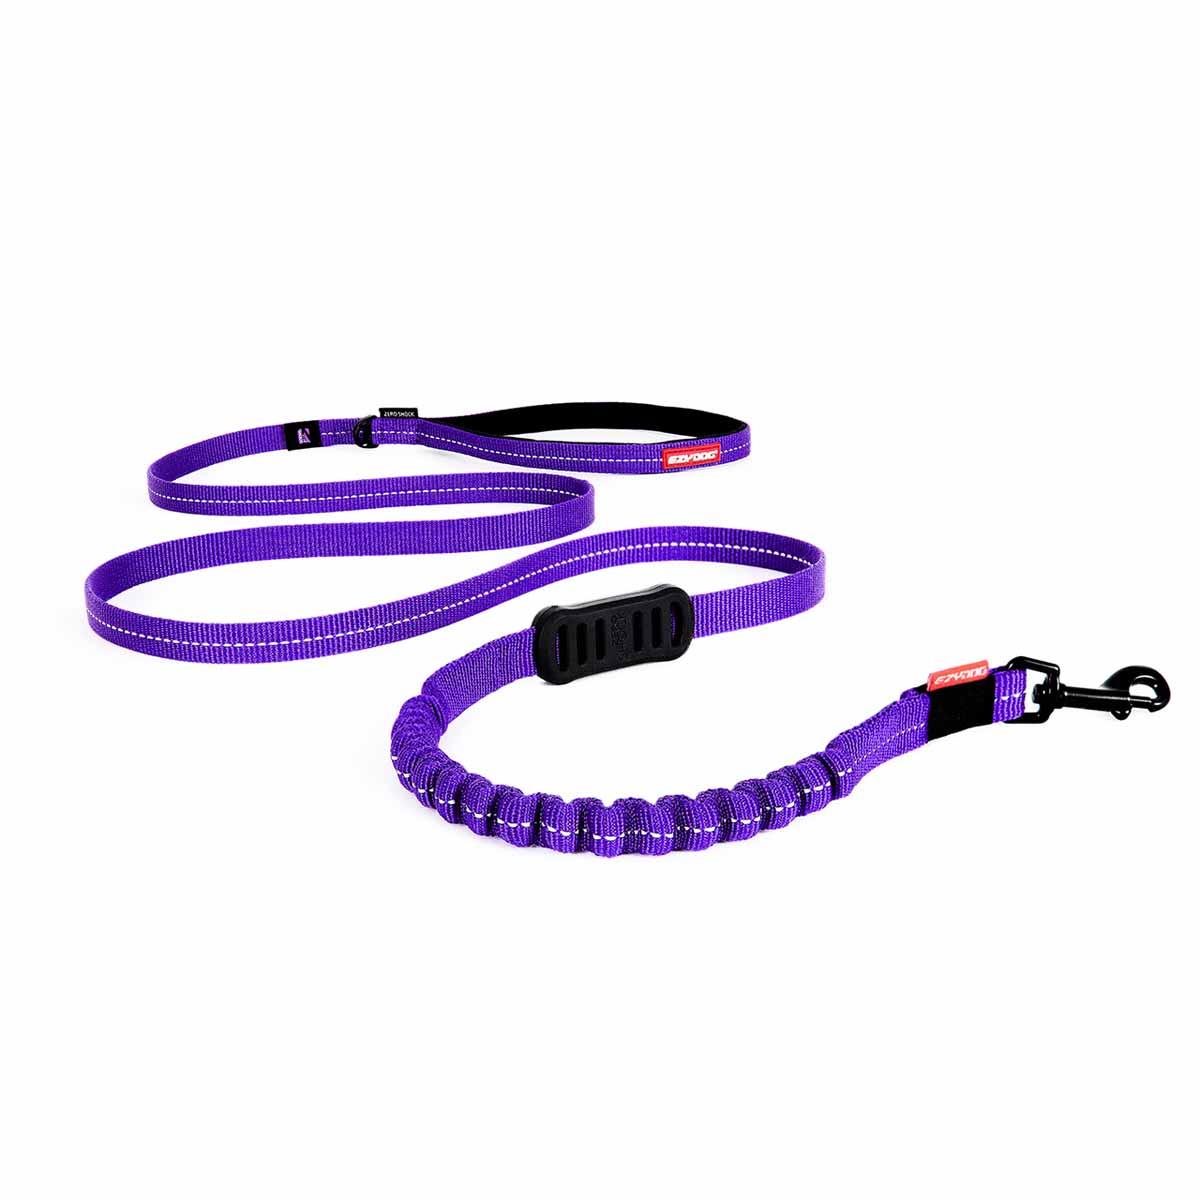 EzyDog Zero Shock Lite Dog Leash - Purple